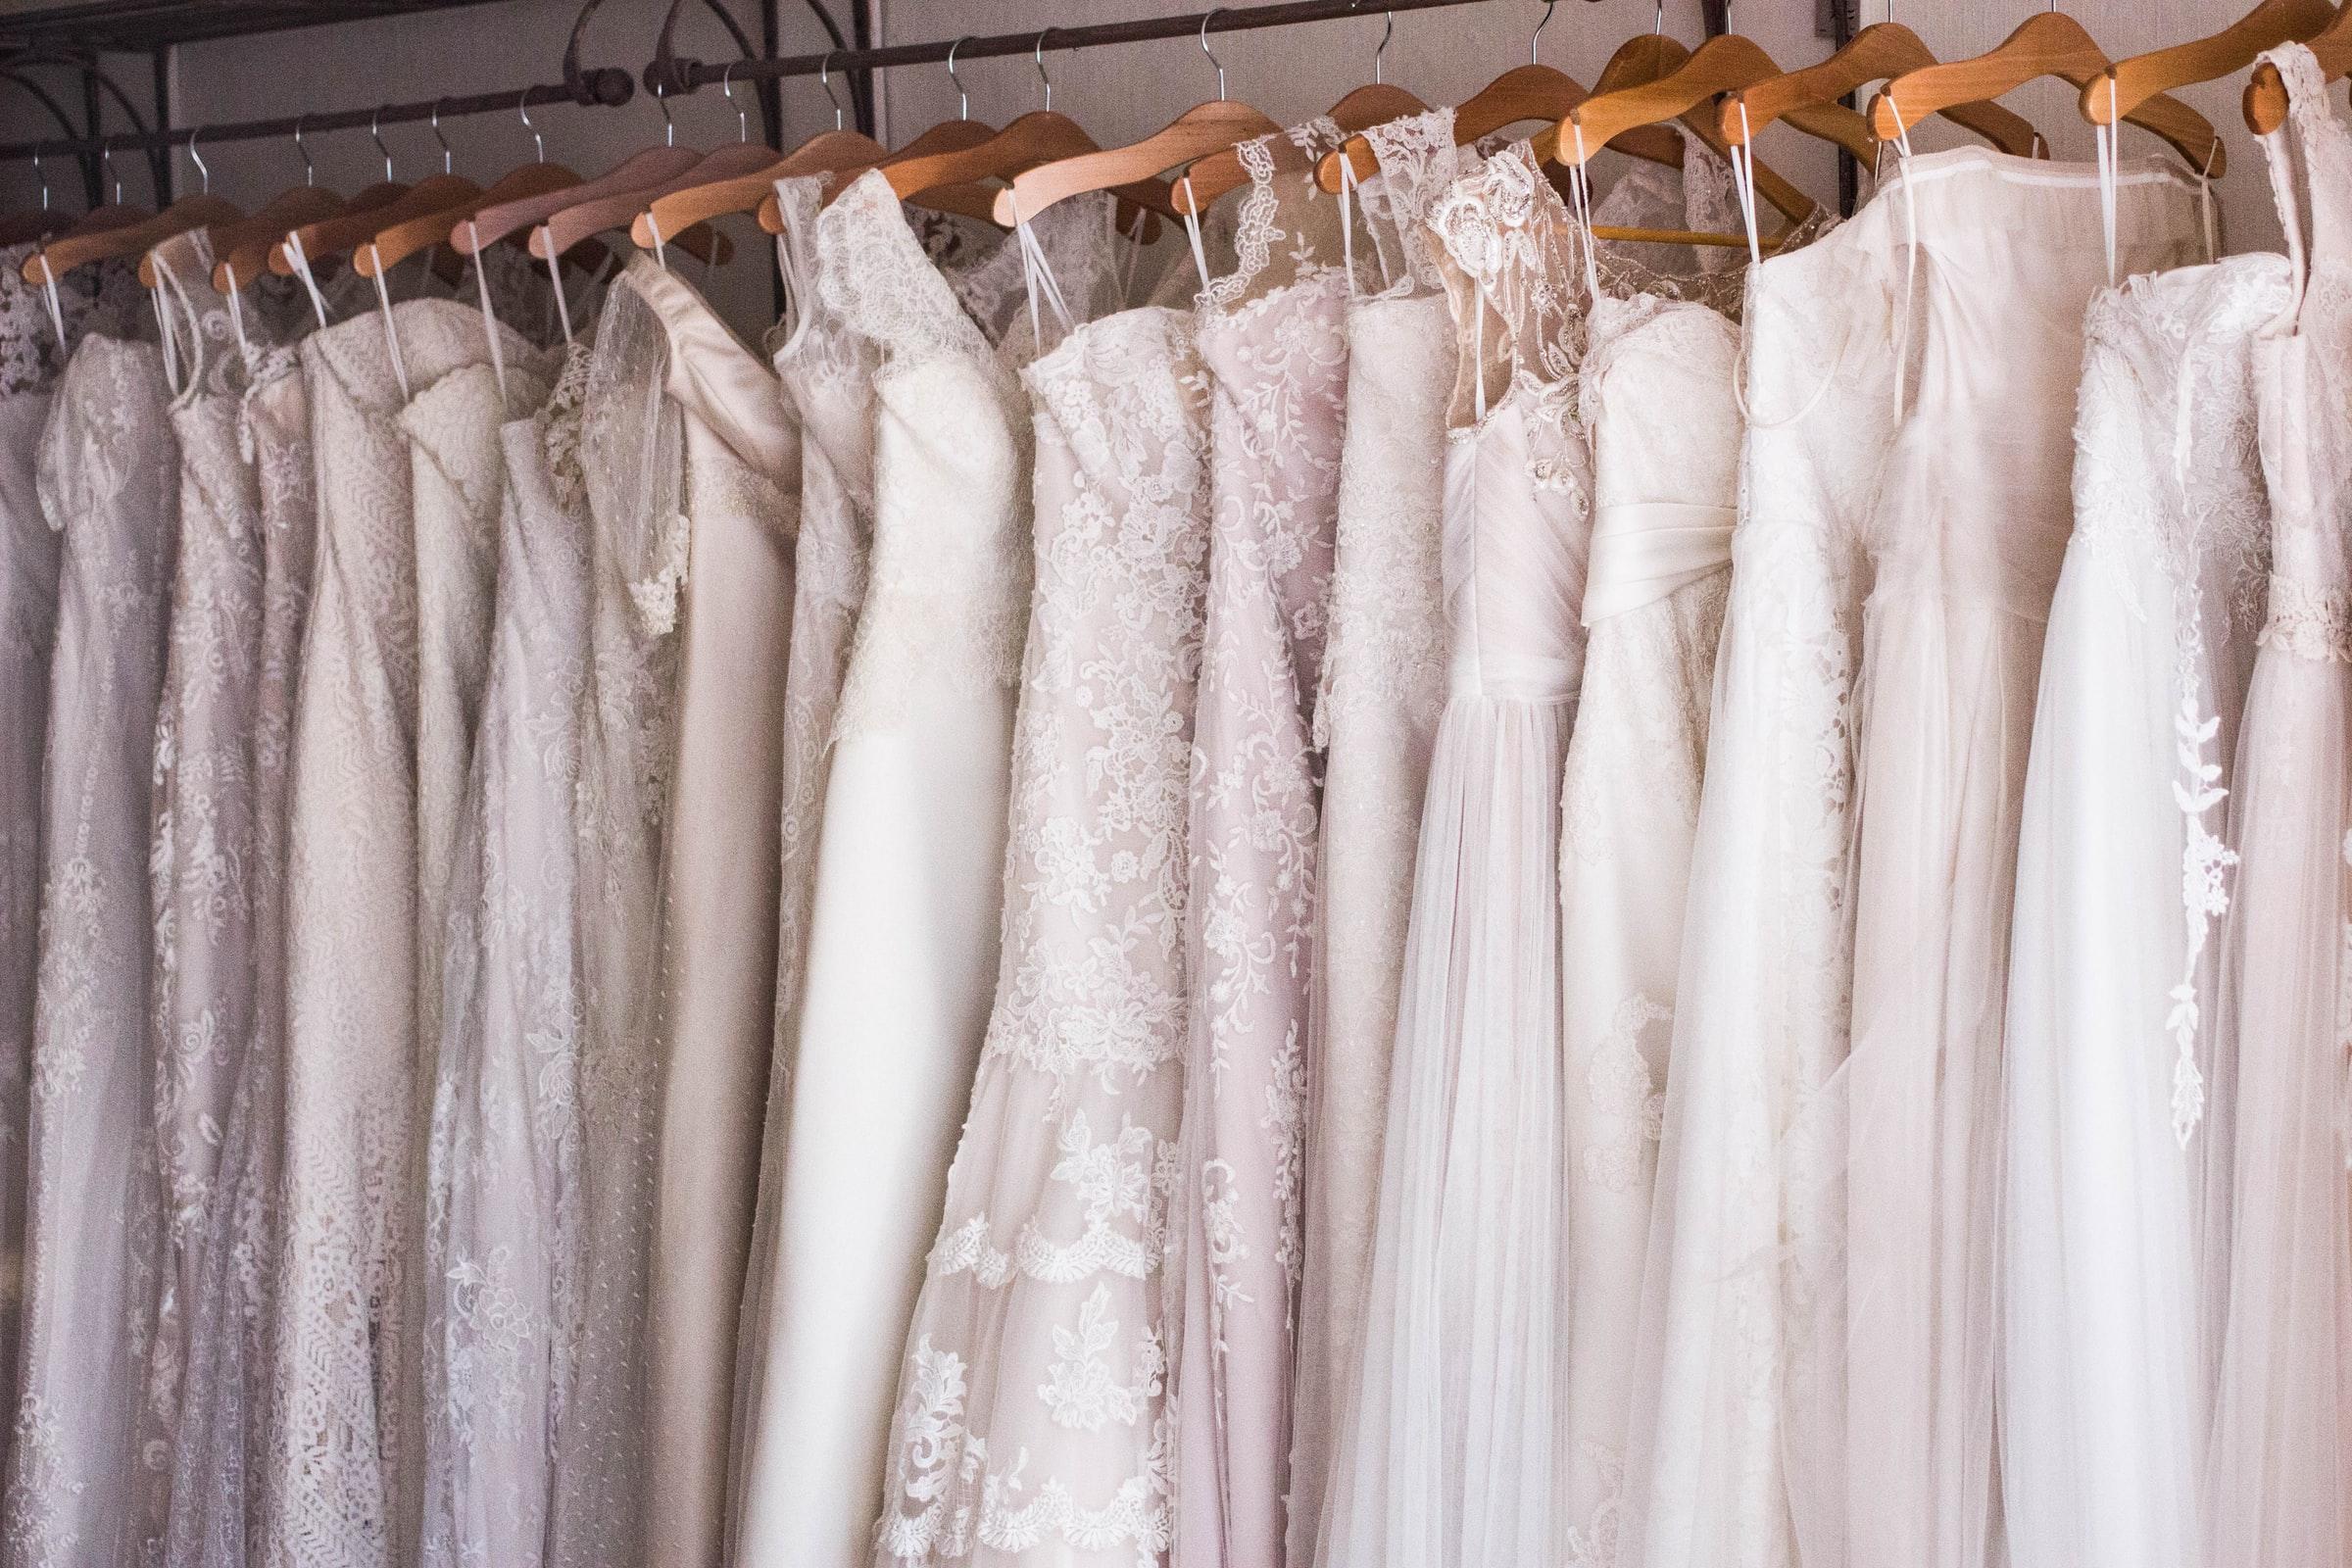 Rail of wedding dresses in wedding dress boutique